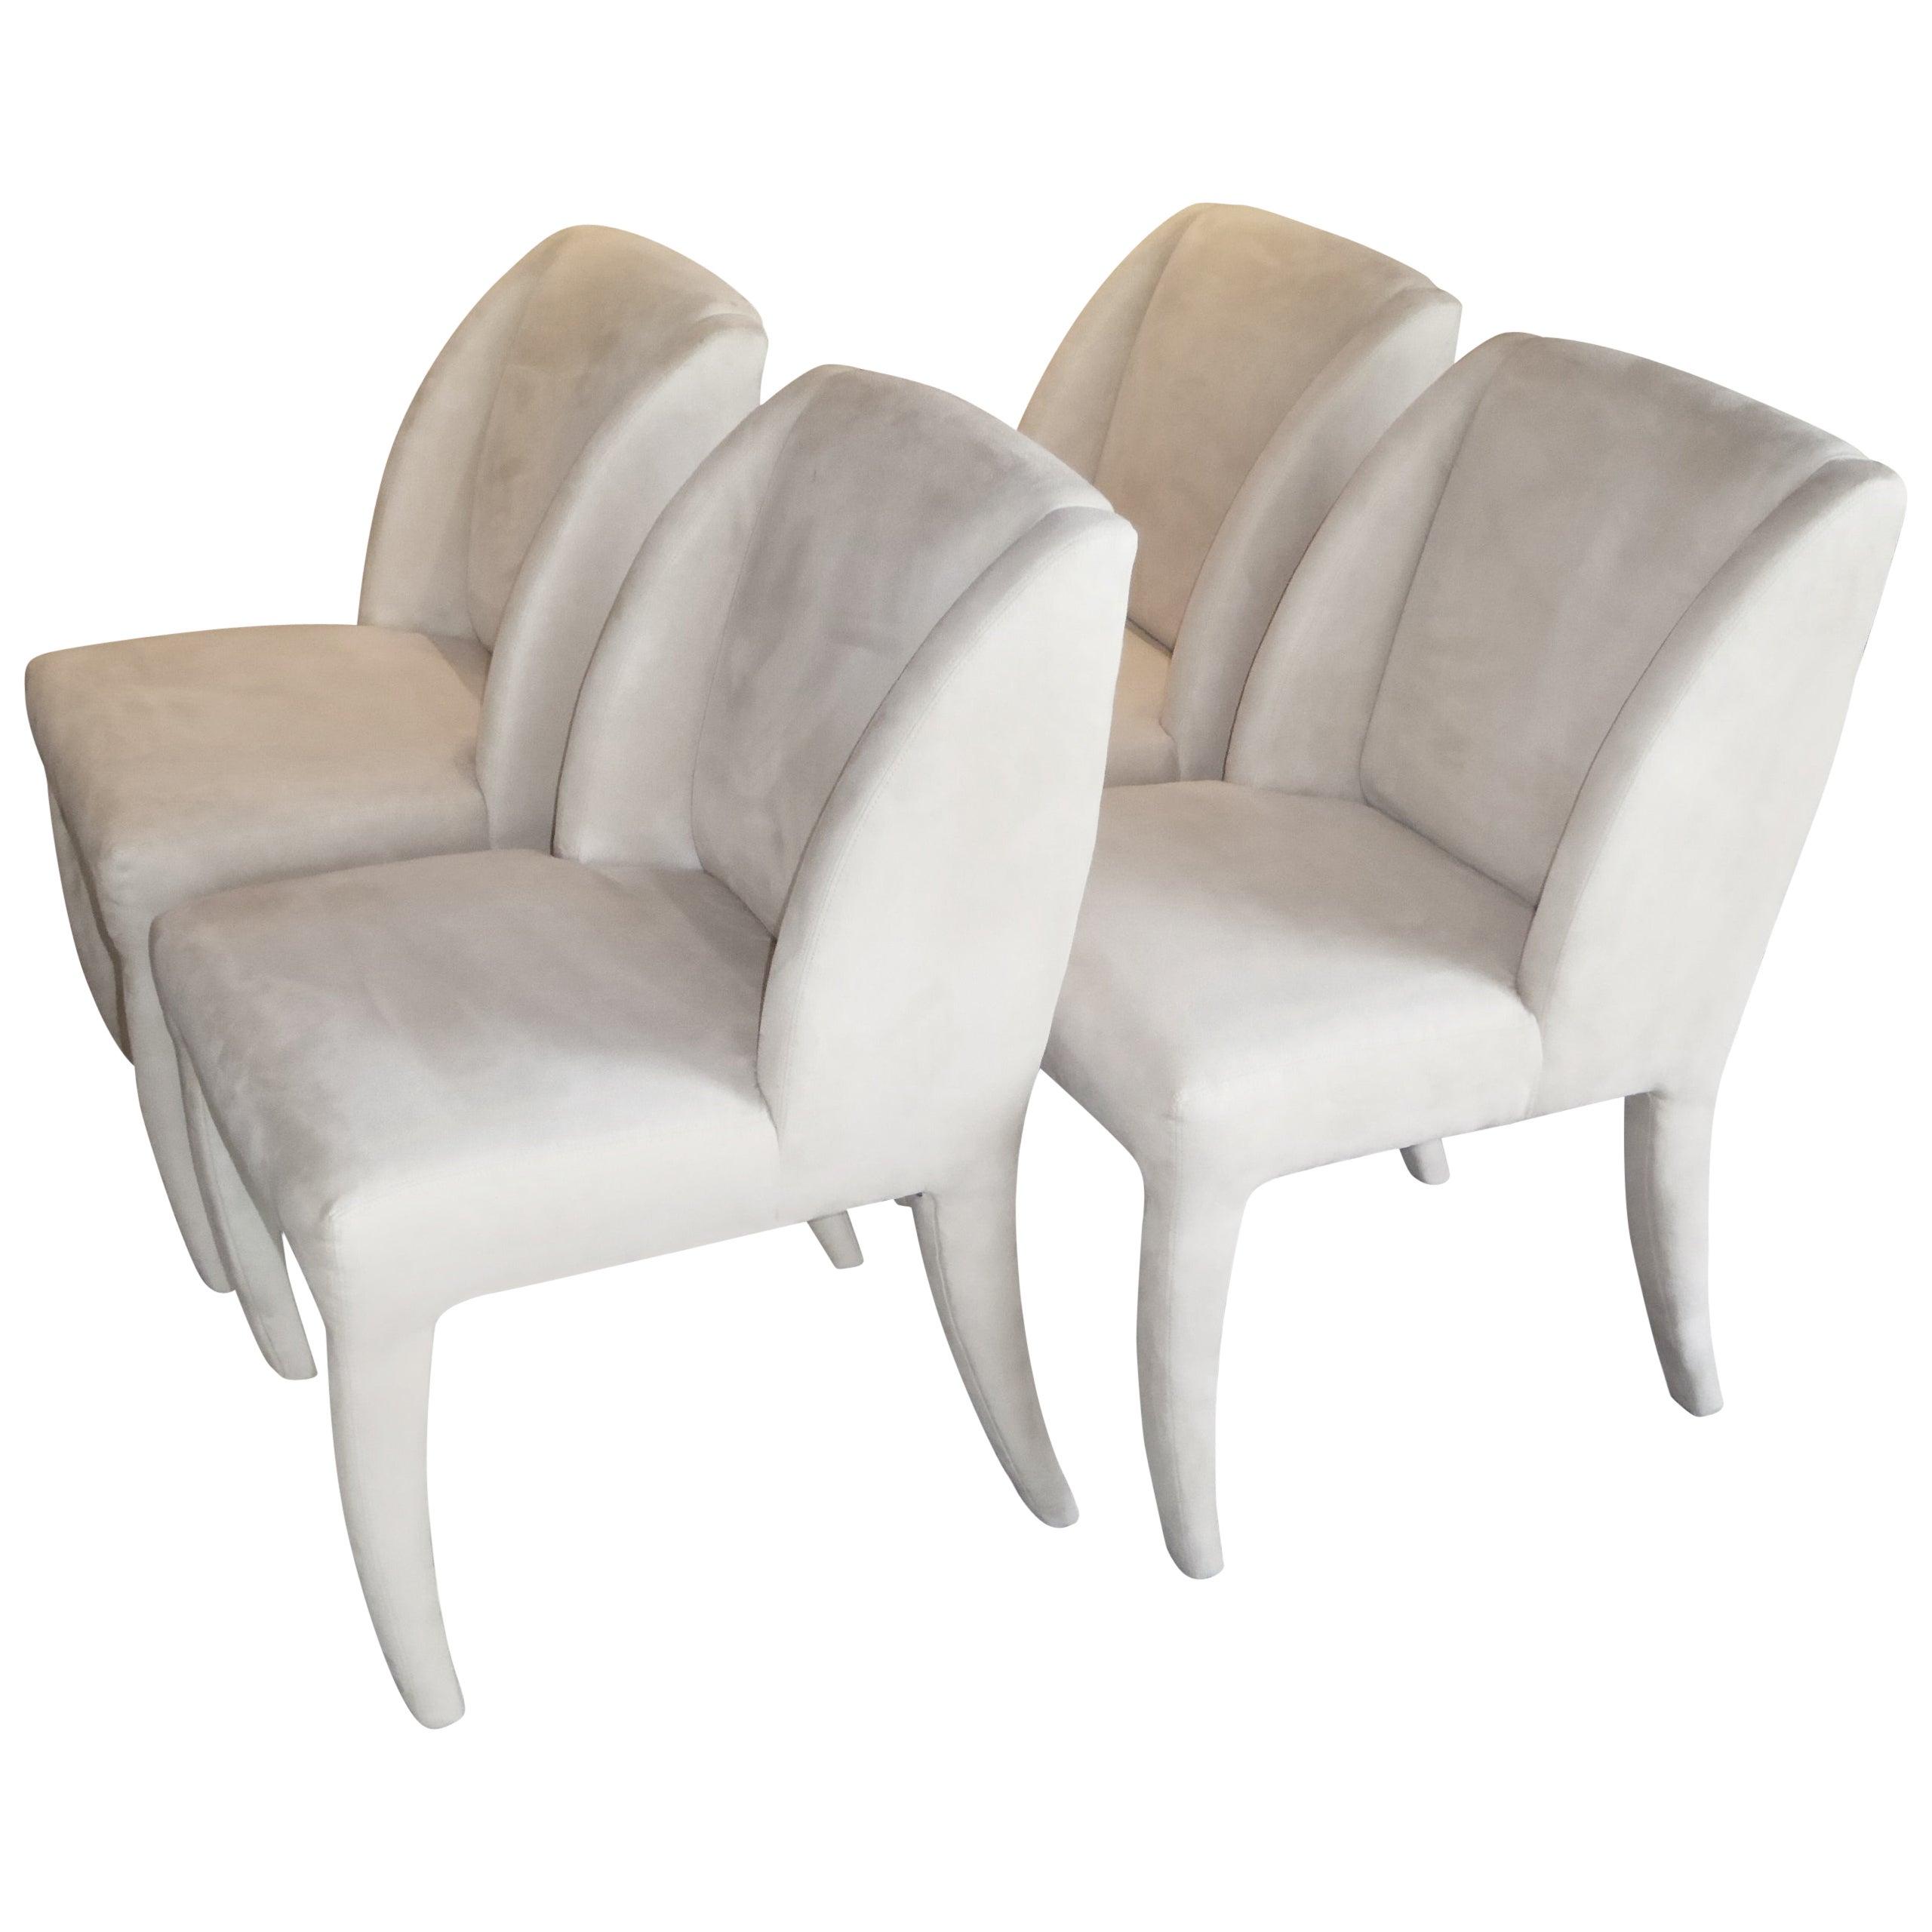 1980s Vladimir Kagan Modern Dining Chairs for Directional